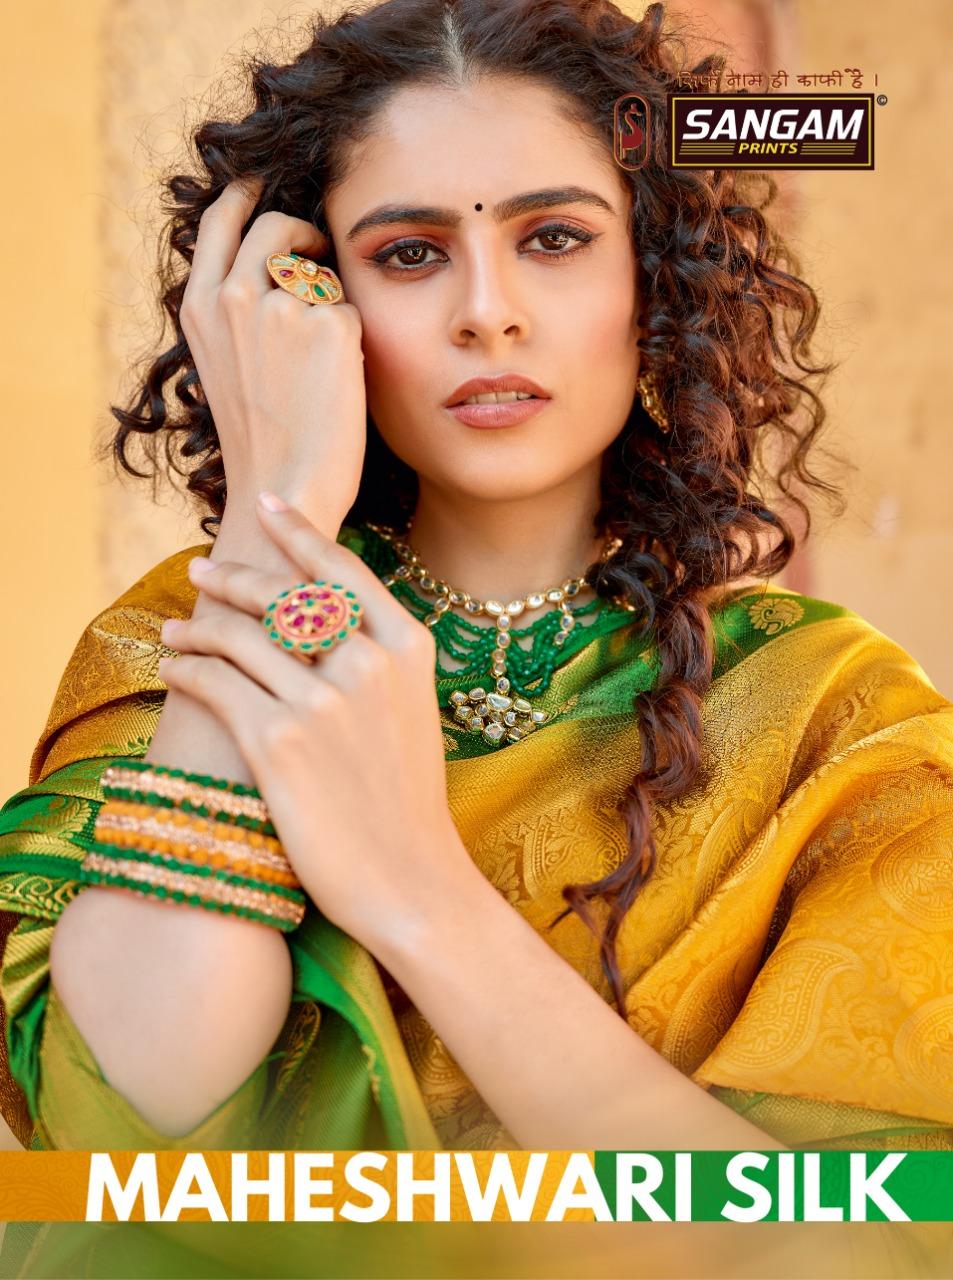 Manjuba Clothing Maheshwari Silk Banarasi Patola Silk Sarees Dealer In Gujarat